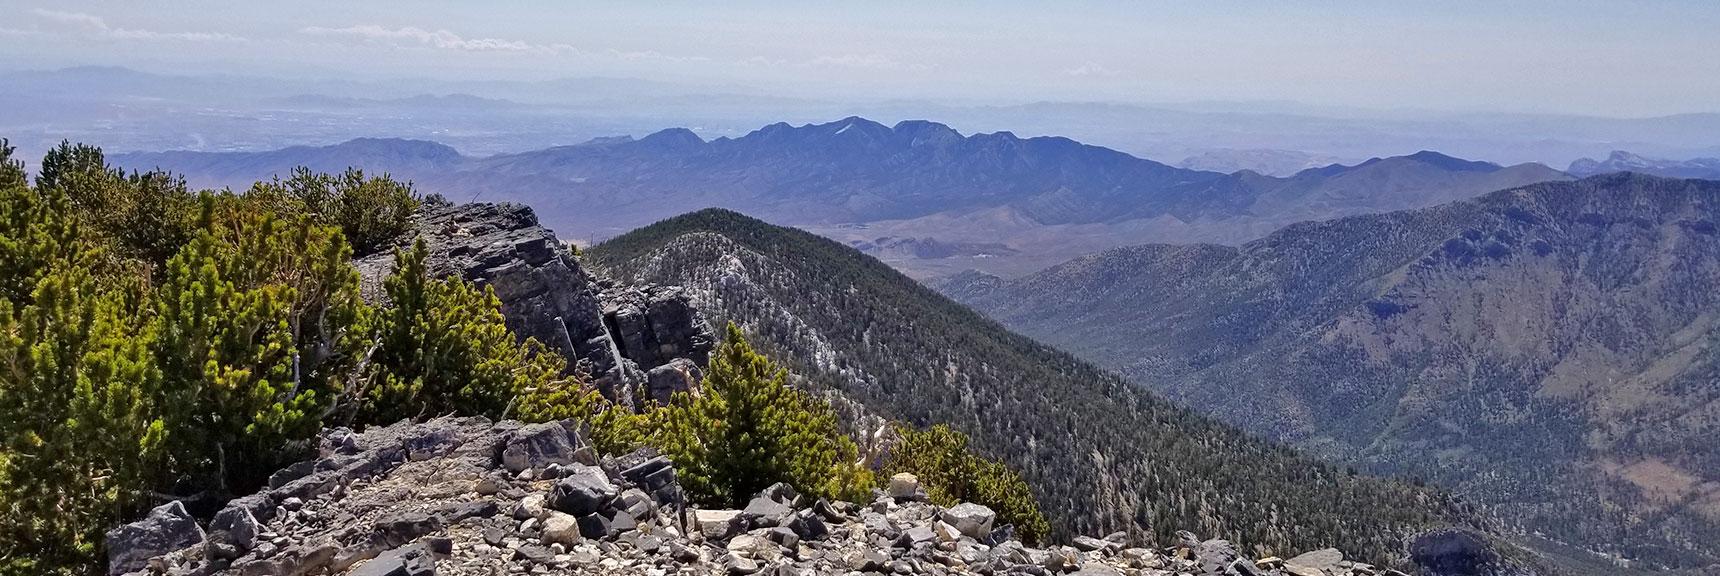 La Madre Mountain Viewed from Mummy's Toe Summit   Mummy Mountain's Toe, Mt. Charleston Wilderness, Nevada